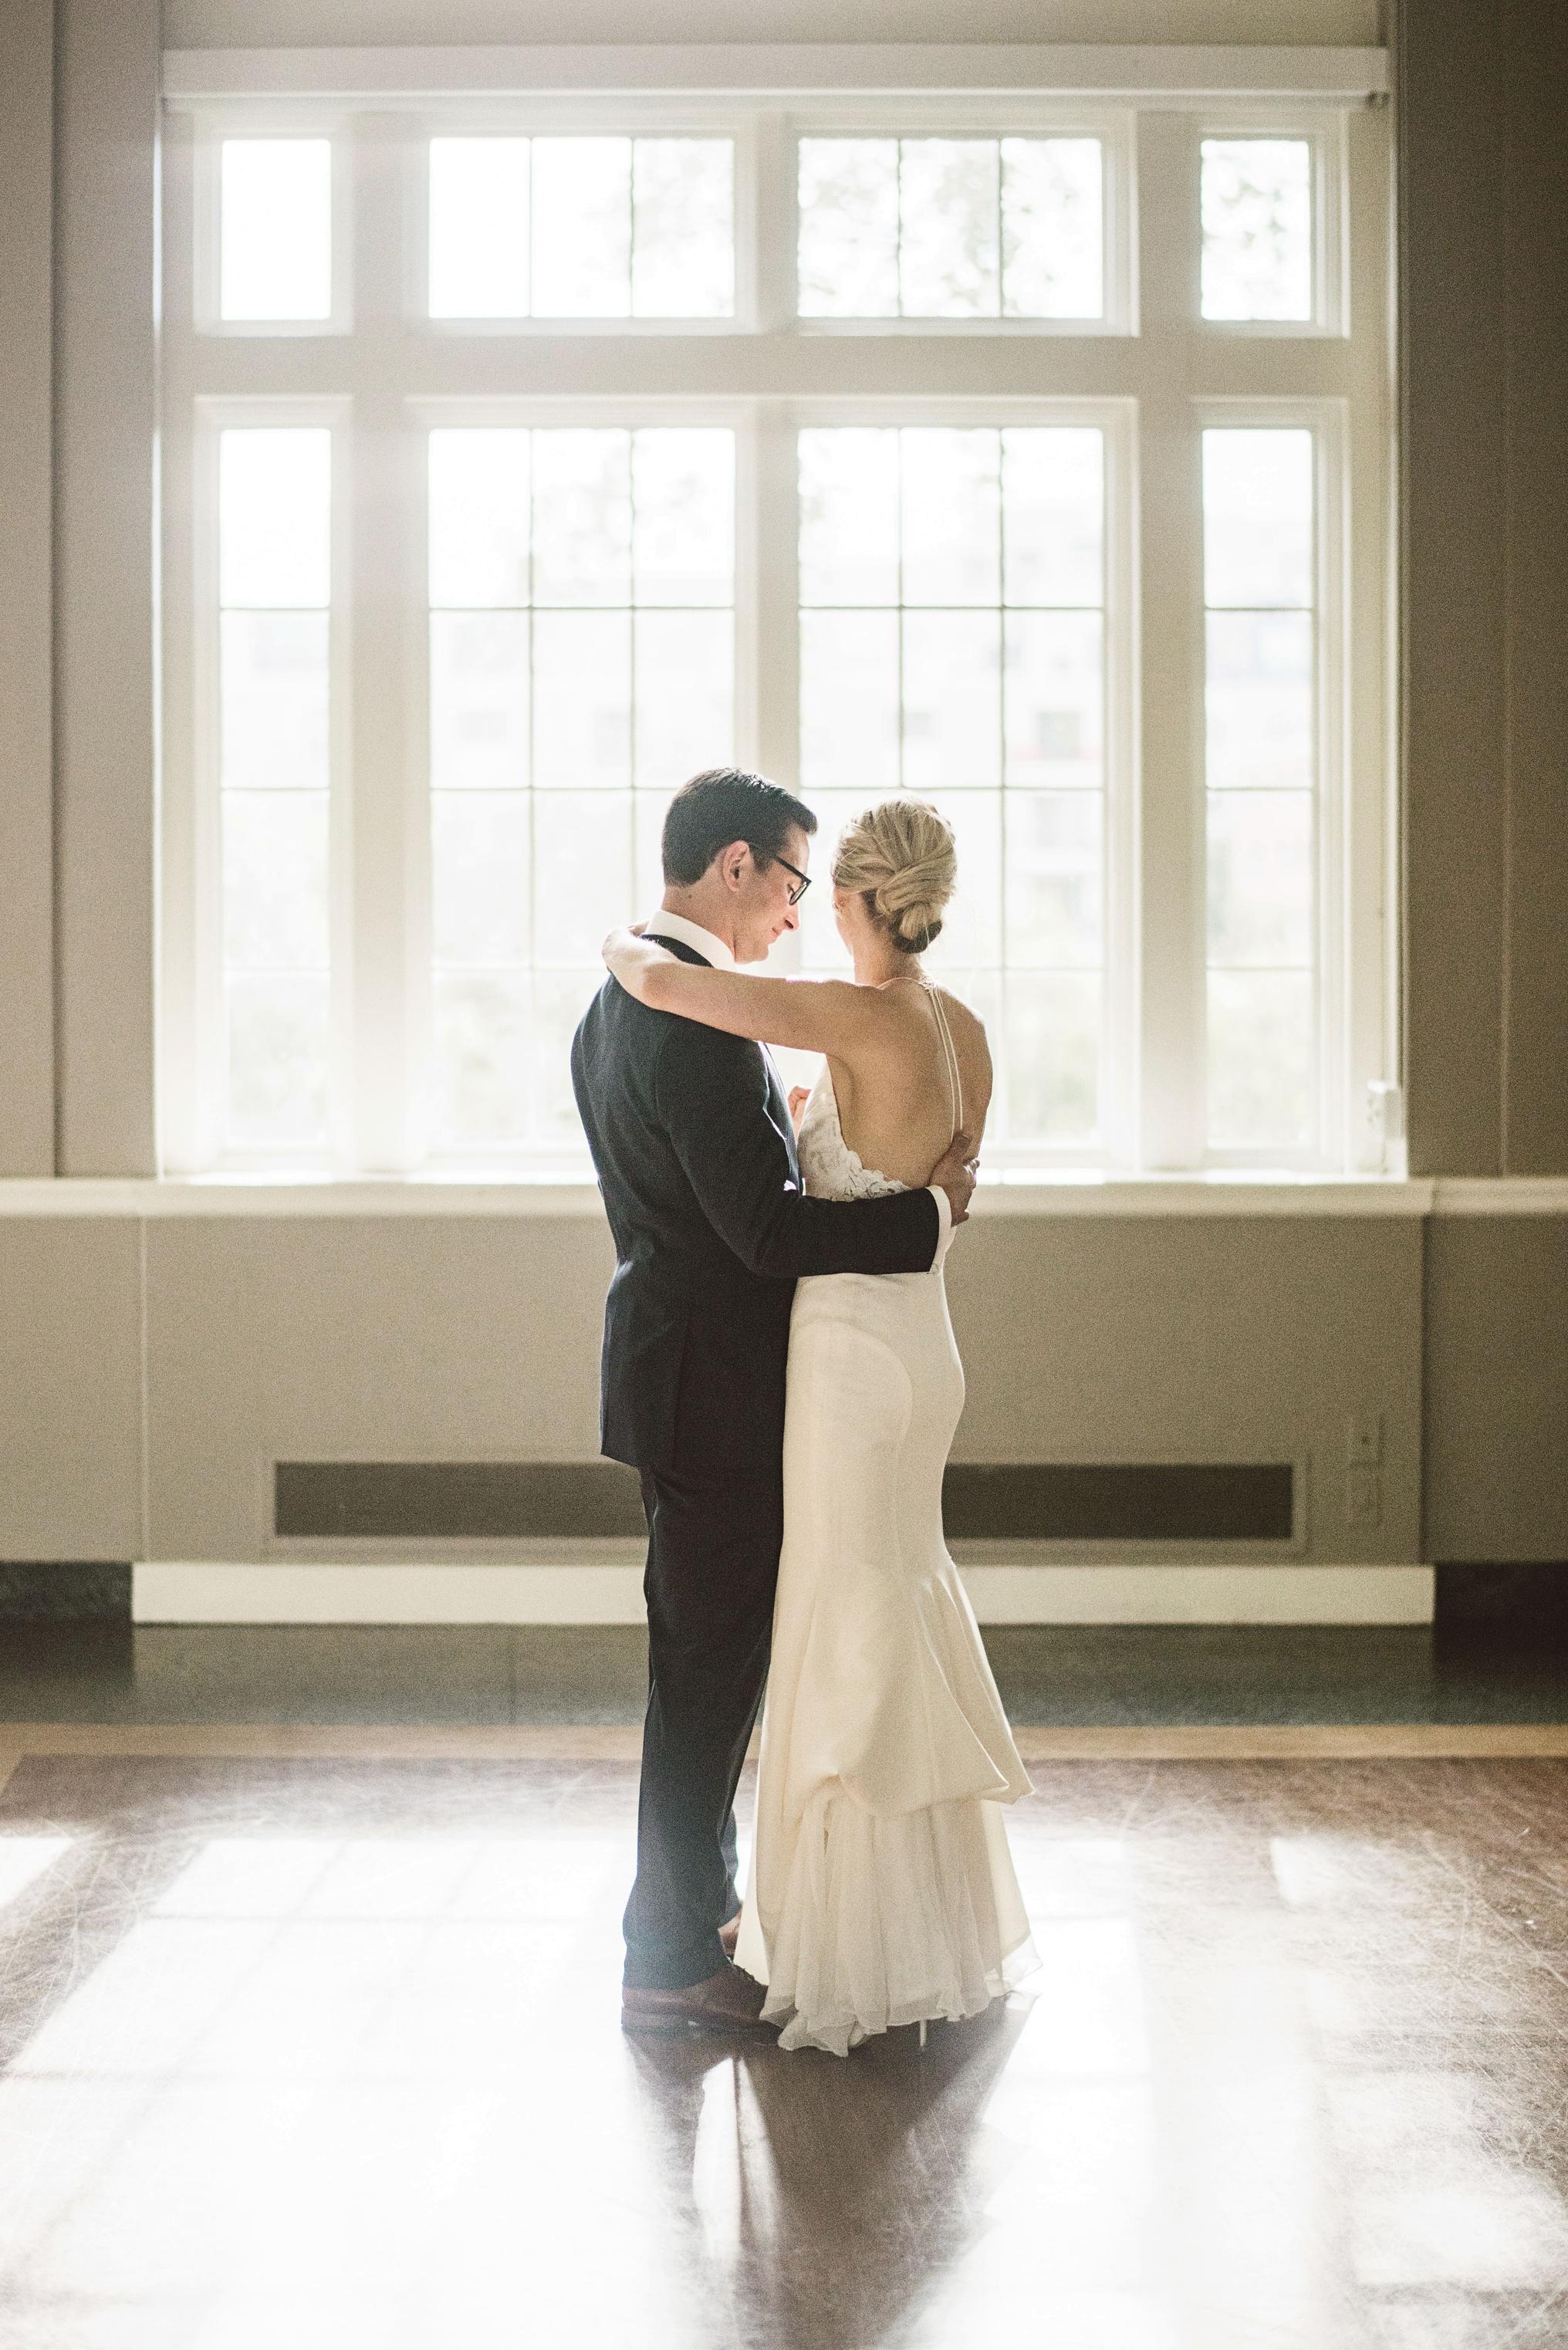 best_wedding_photography_2017_by_lucas_botz_photography_213.jpg